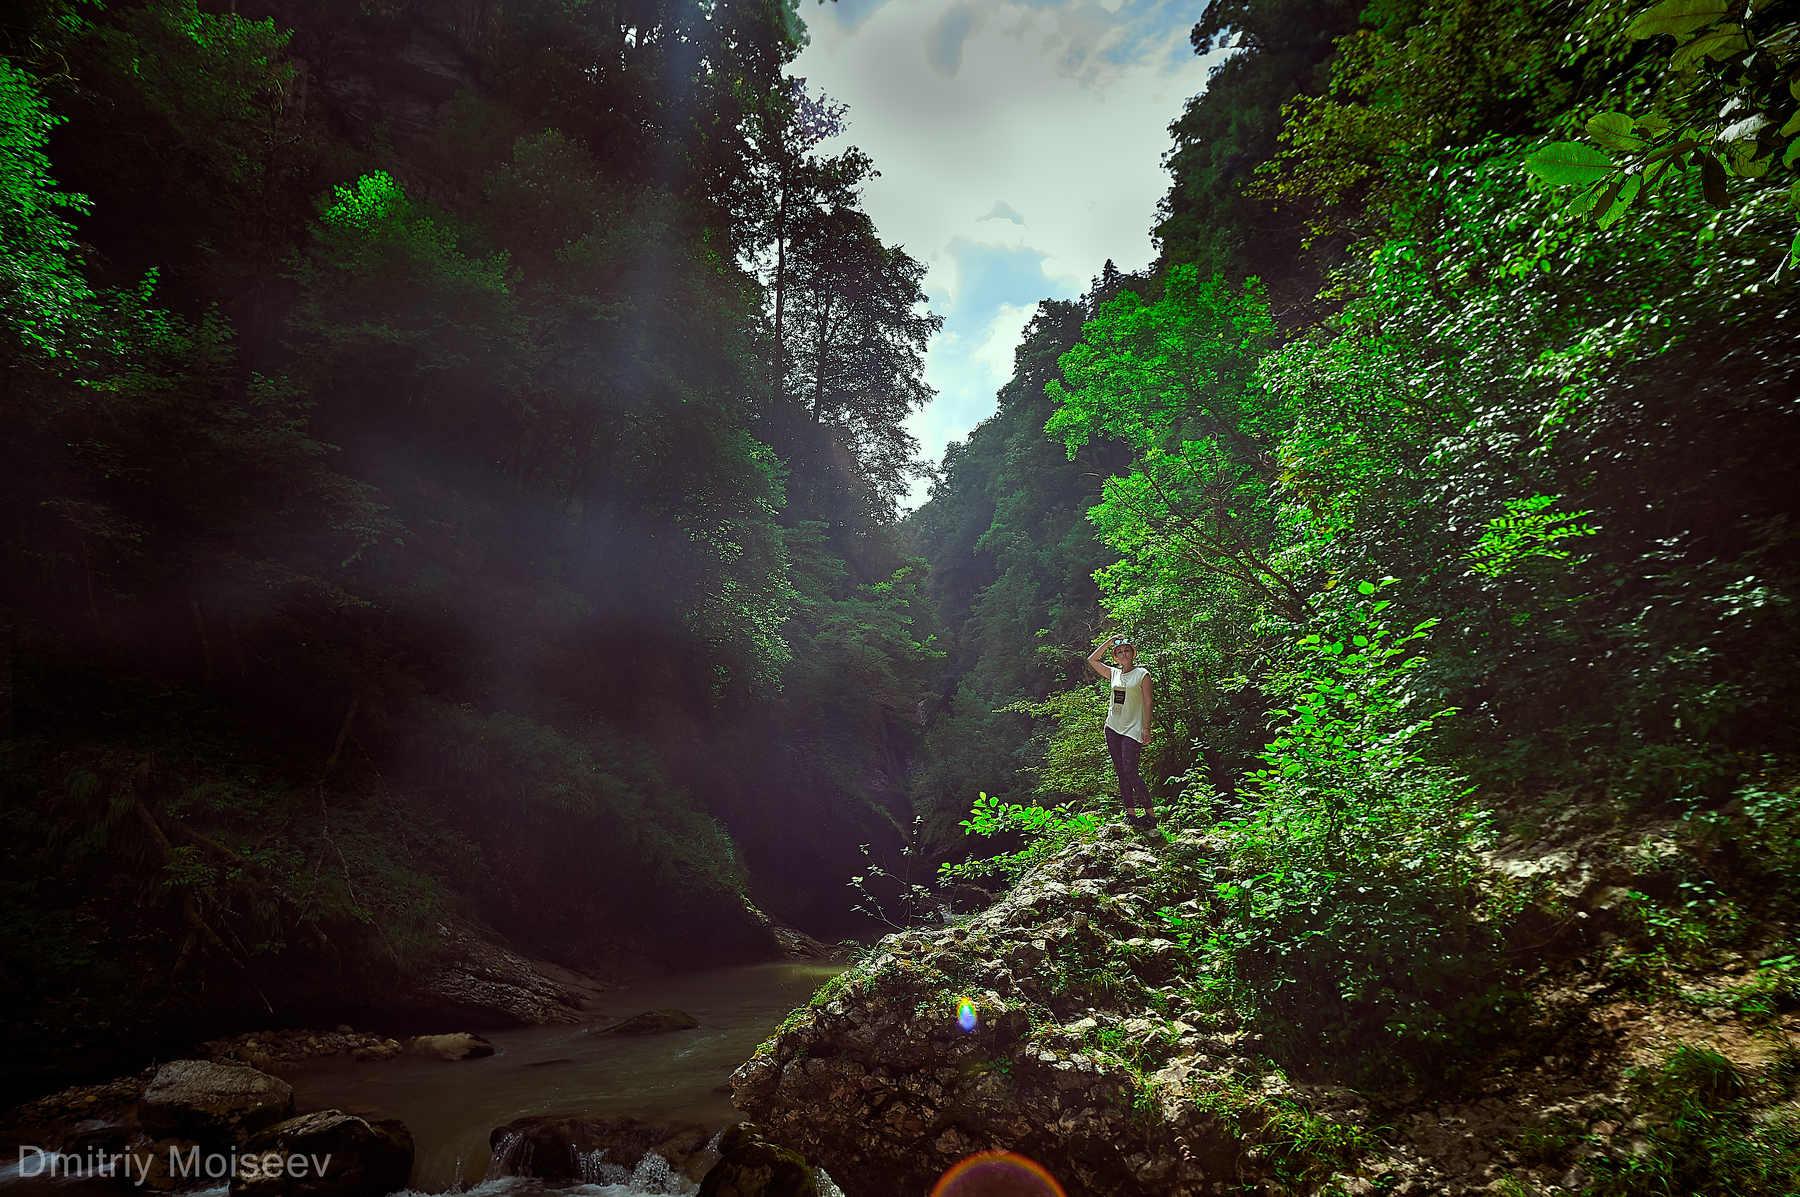 гуамка, гуамскоеущелье, краснодар, горы, реки, скалы, girl, природа, ущелье, Дмитрий Моисеев